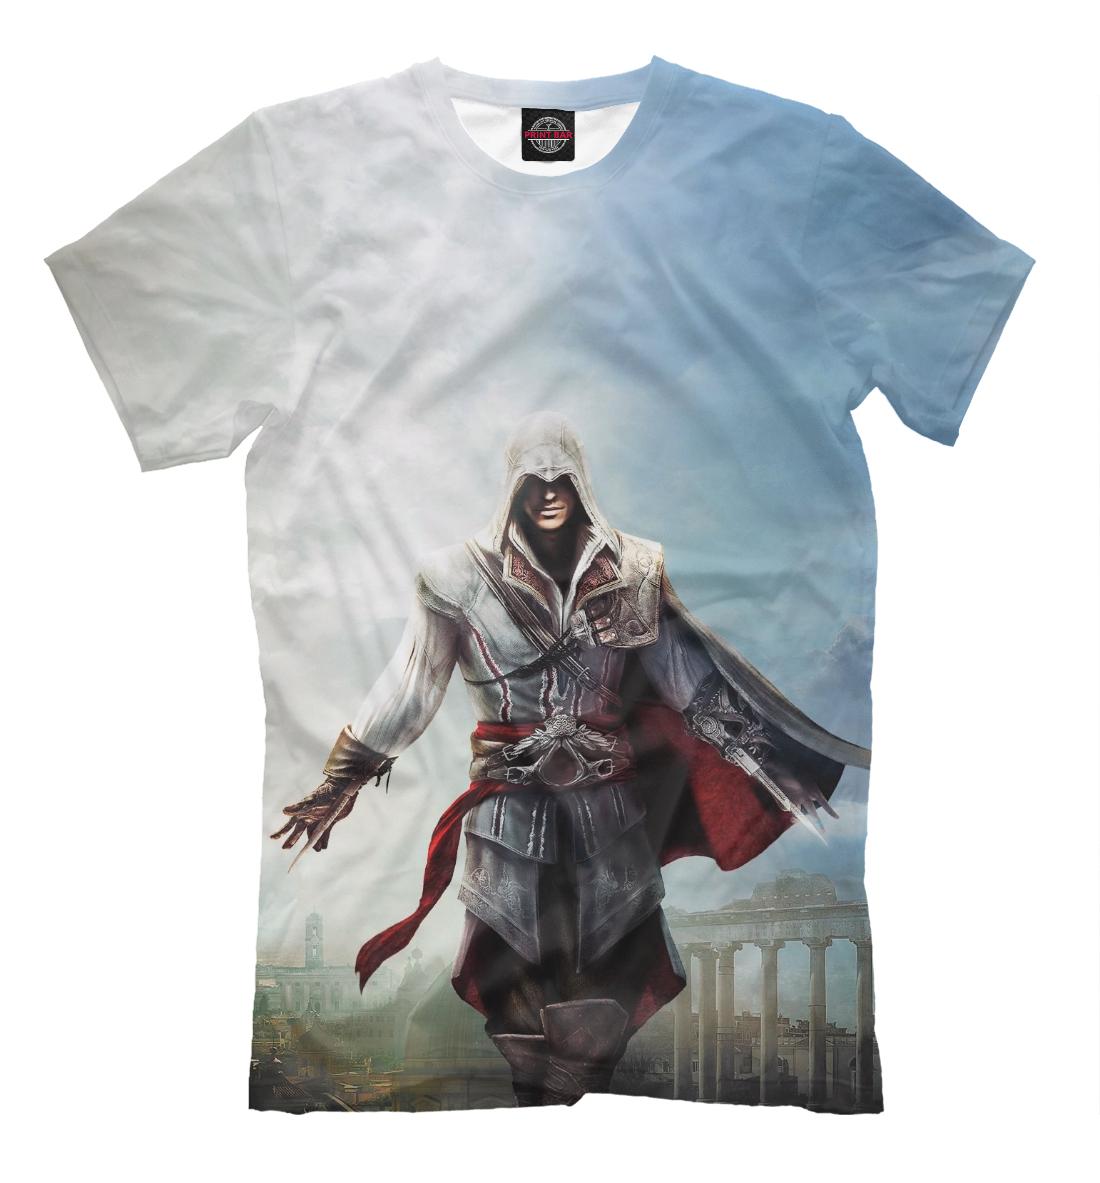 Купить Assassin's Creed Ezio Collection, Printbar, Футболки, RPG-324153-fut-2